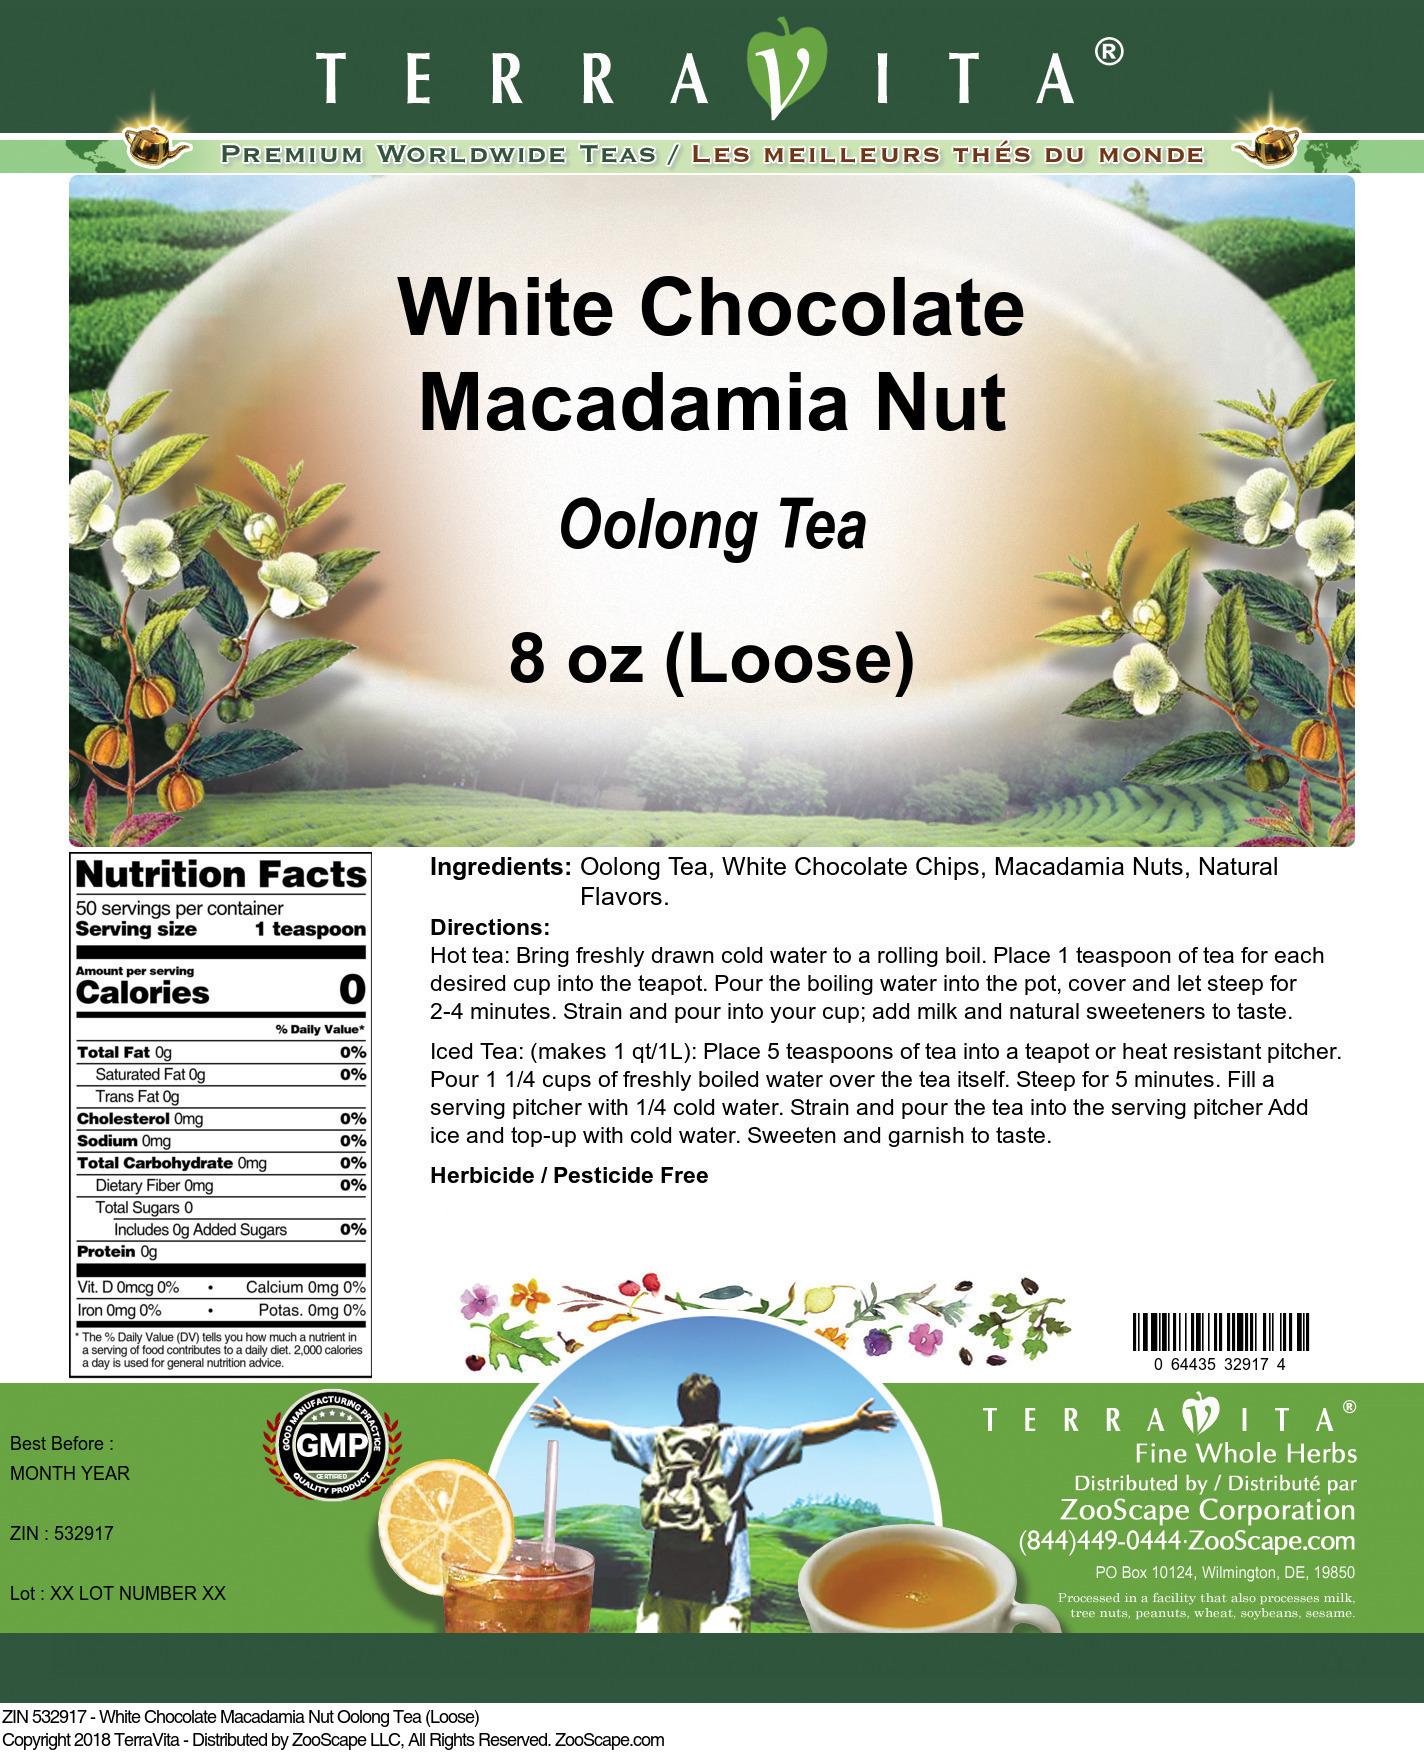 White Chocolate Macadamia Nut Oolong Tea